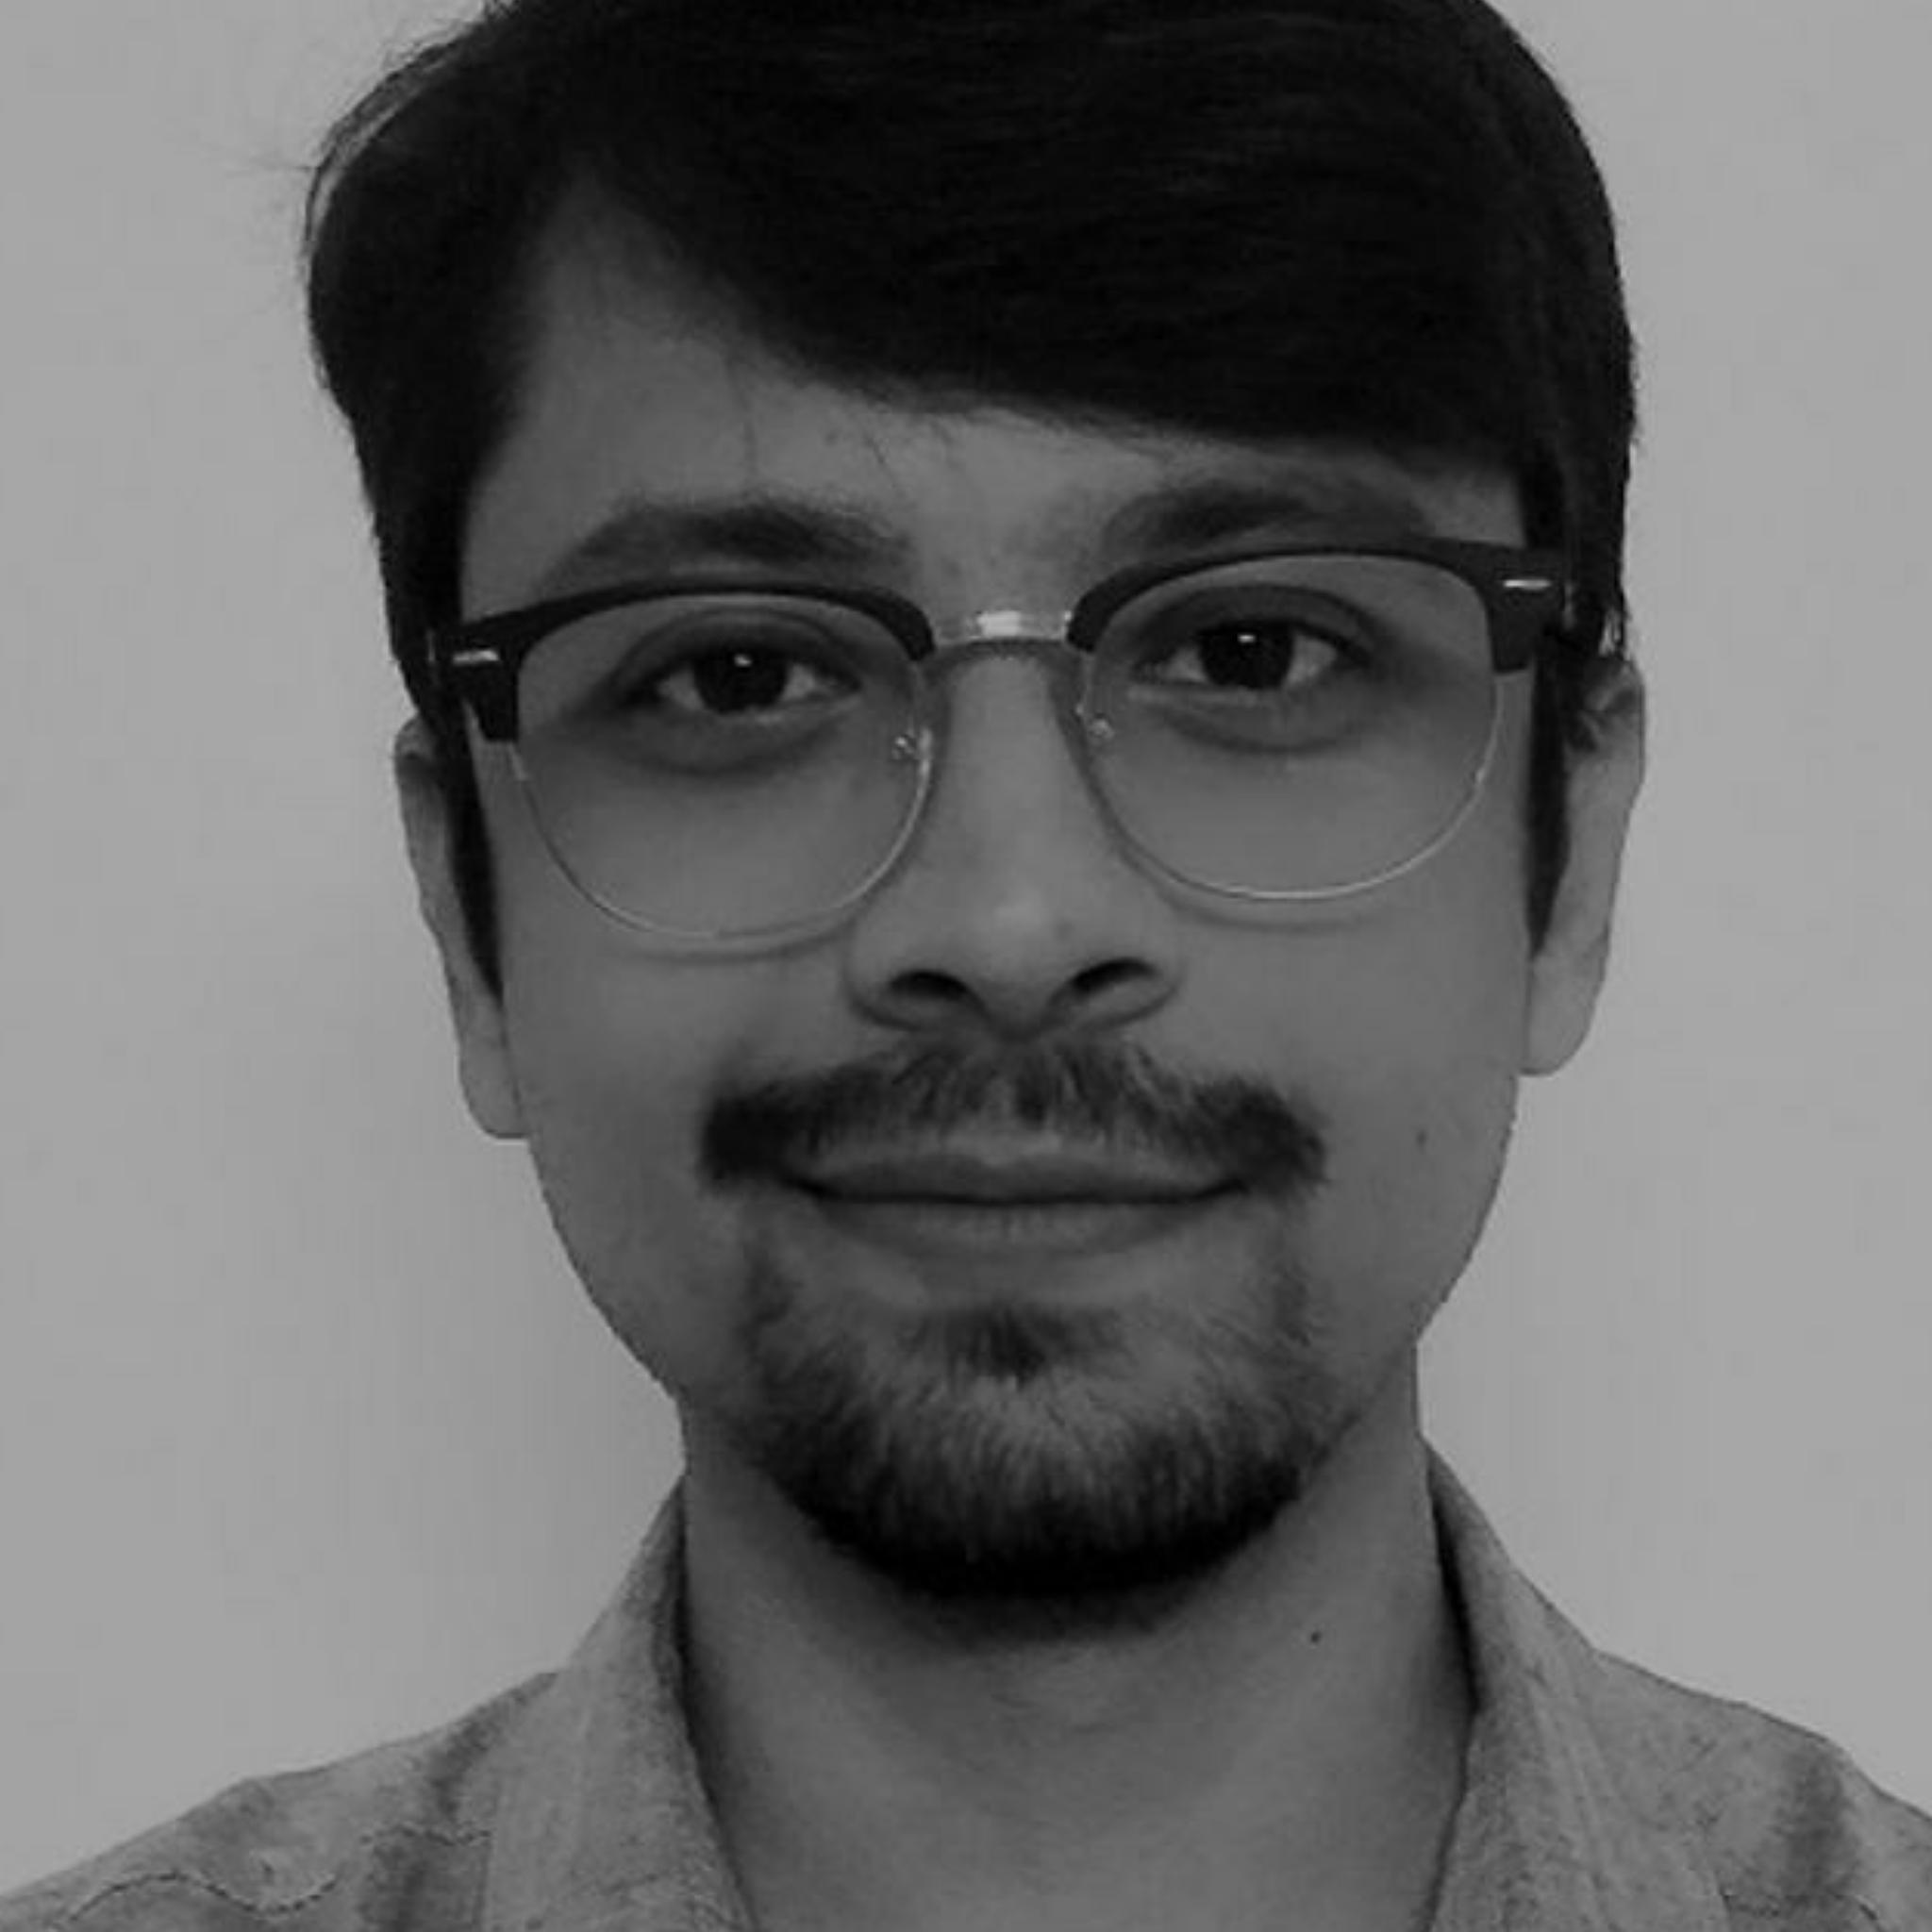 https://www.indiantelevision.com/sites/default/files/styles/smartcrop_800x800/public/images/tv-images/2021/06/15/photogrid_plus_1623743455265.jpg?itok=DxITf7o7